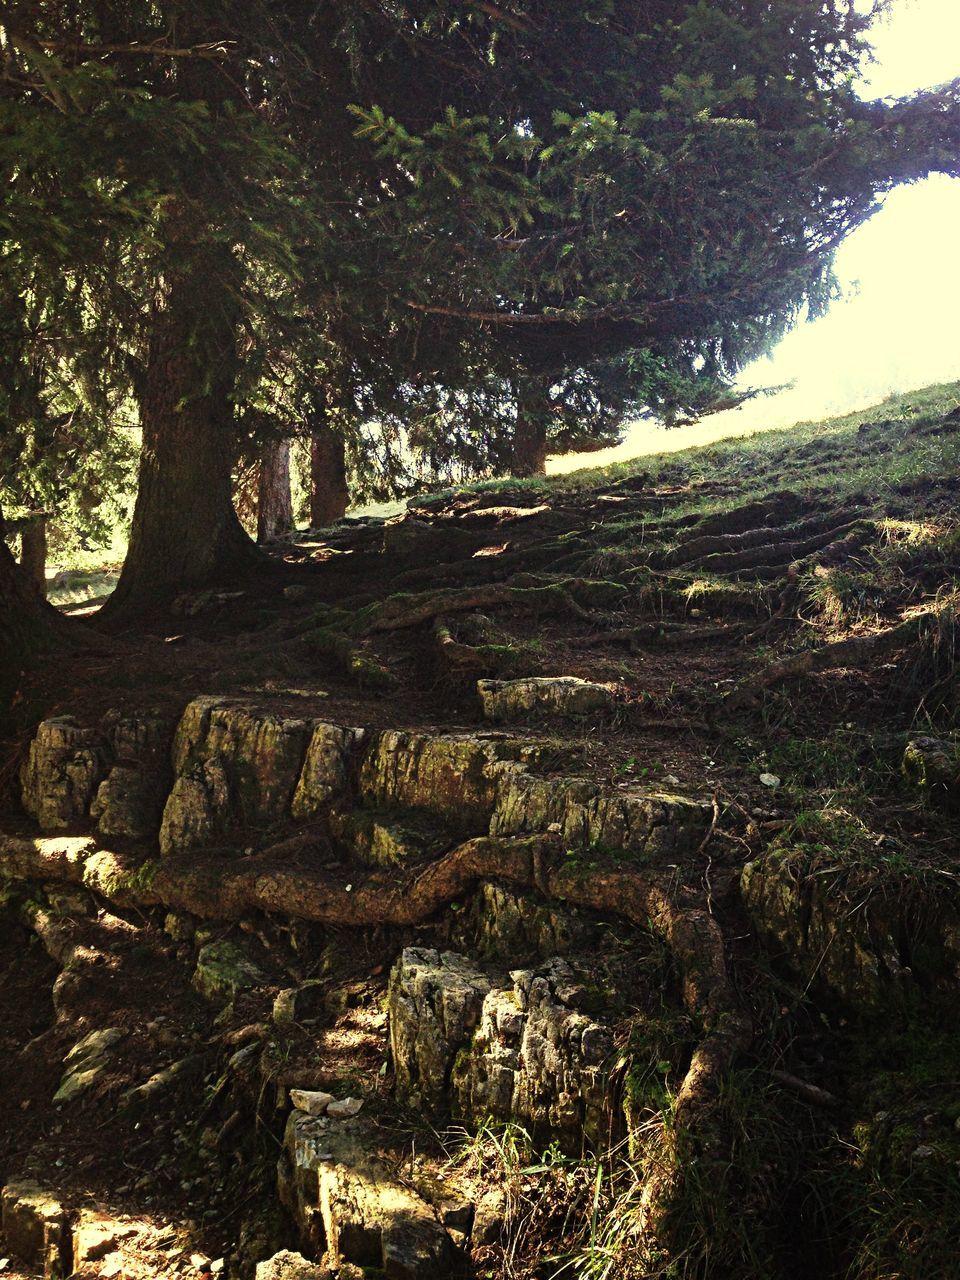 Trees Growing On Rocks